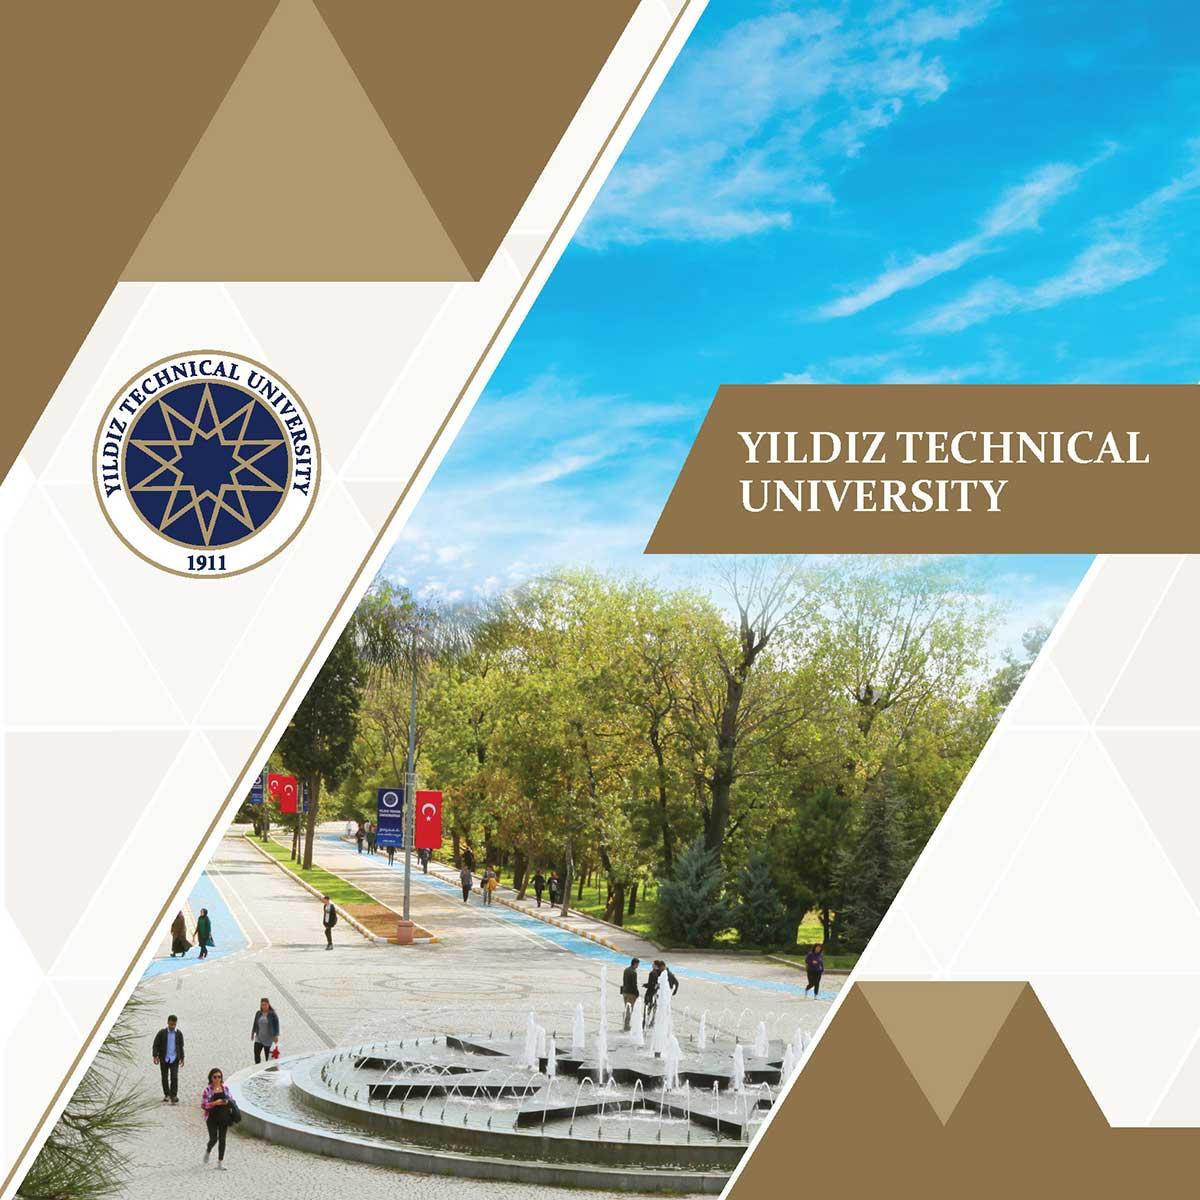 Yildiz_Technical_University_İstanbul_opt